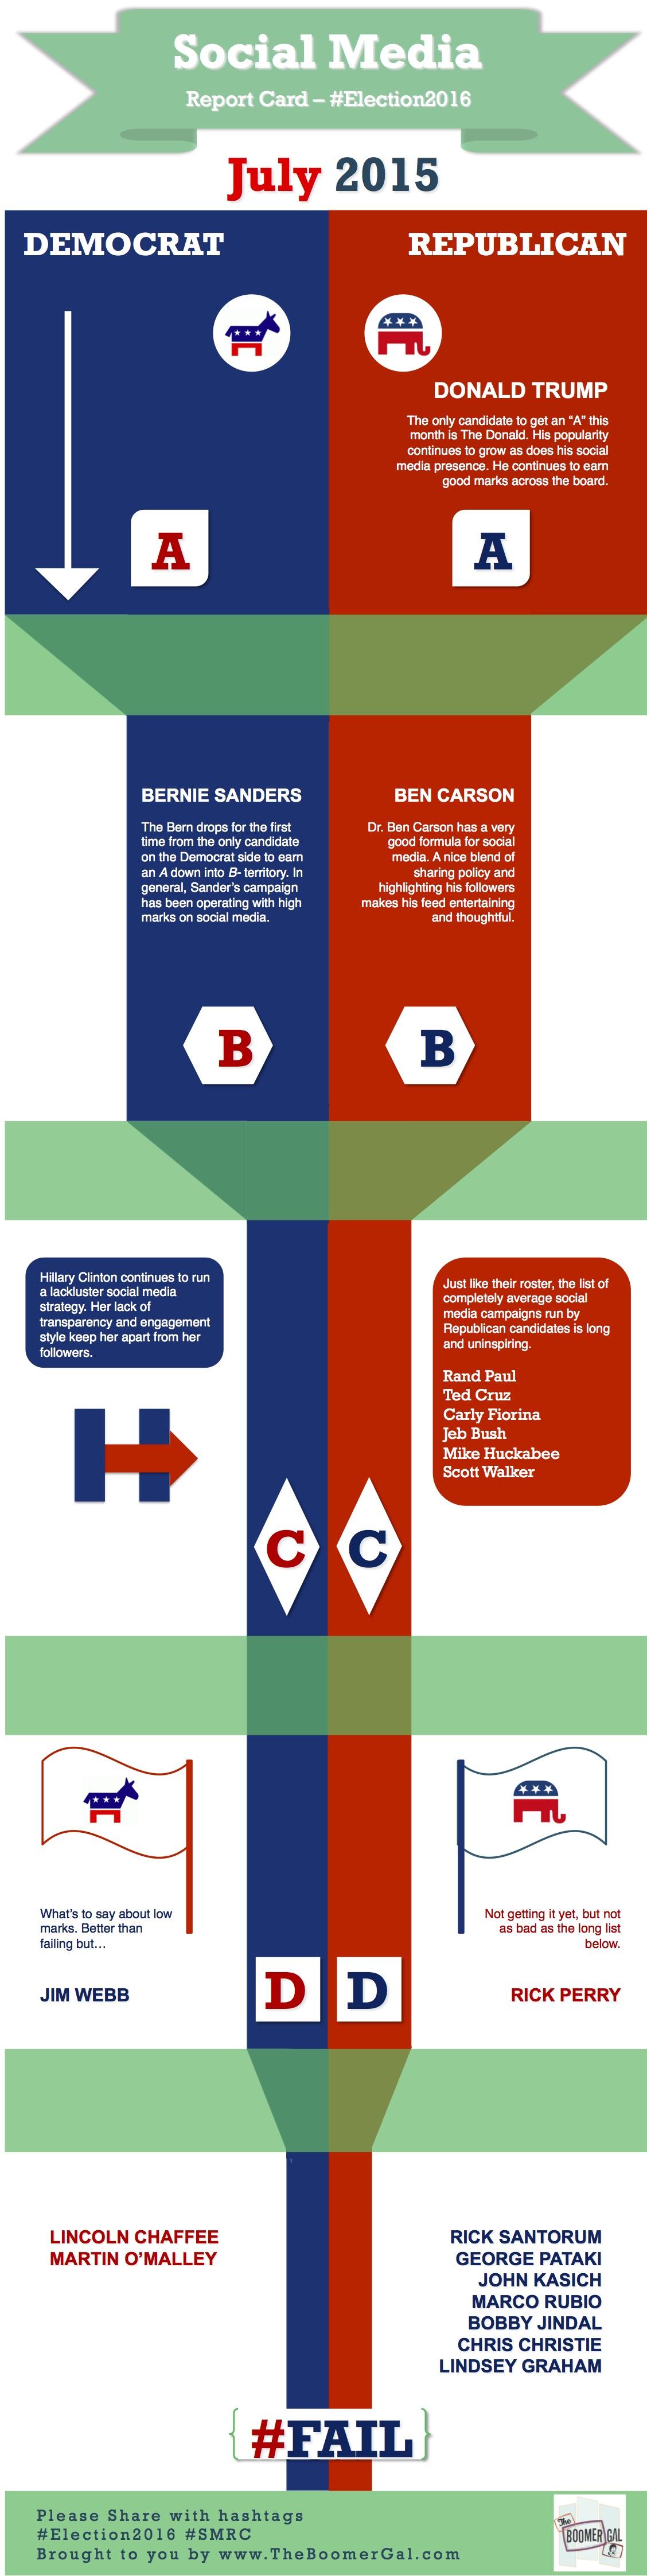 election 2016 social media